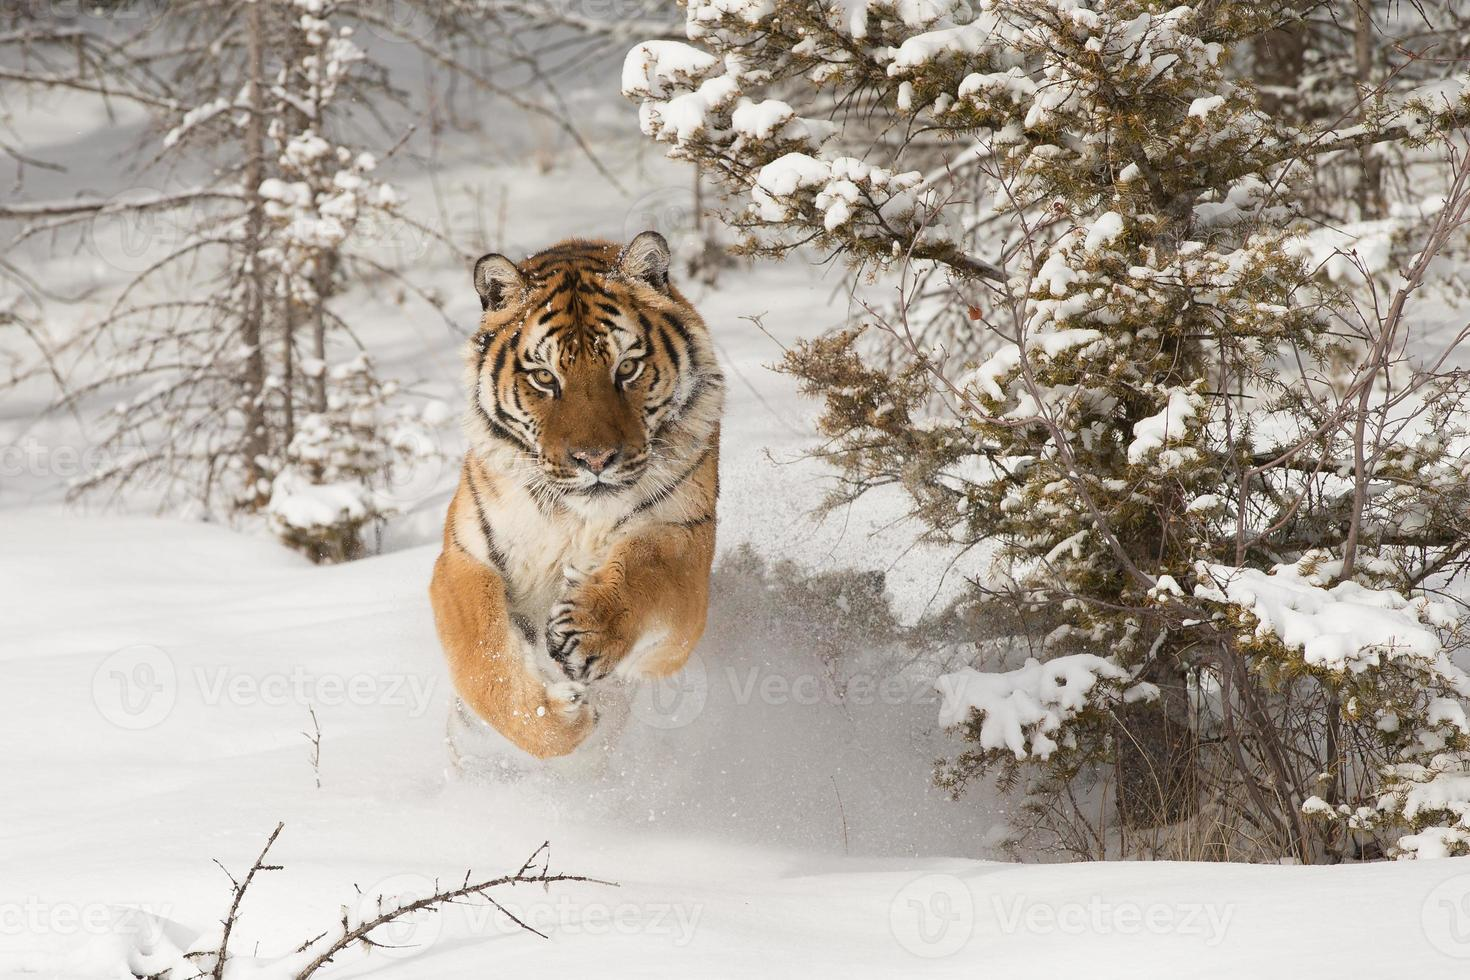 Rare Adult Siberian Tiger in snowy winter scene photo